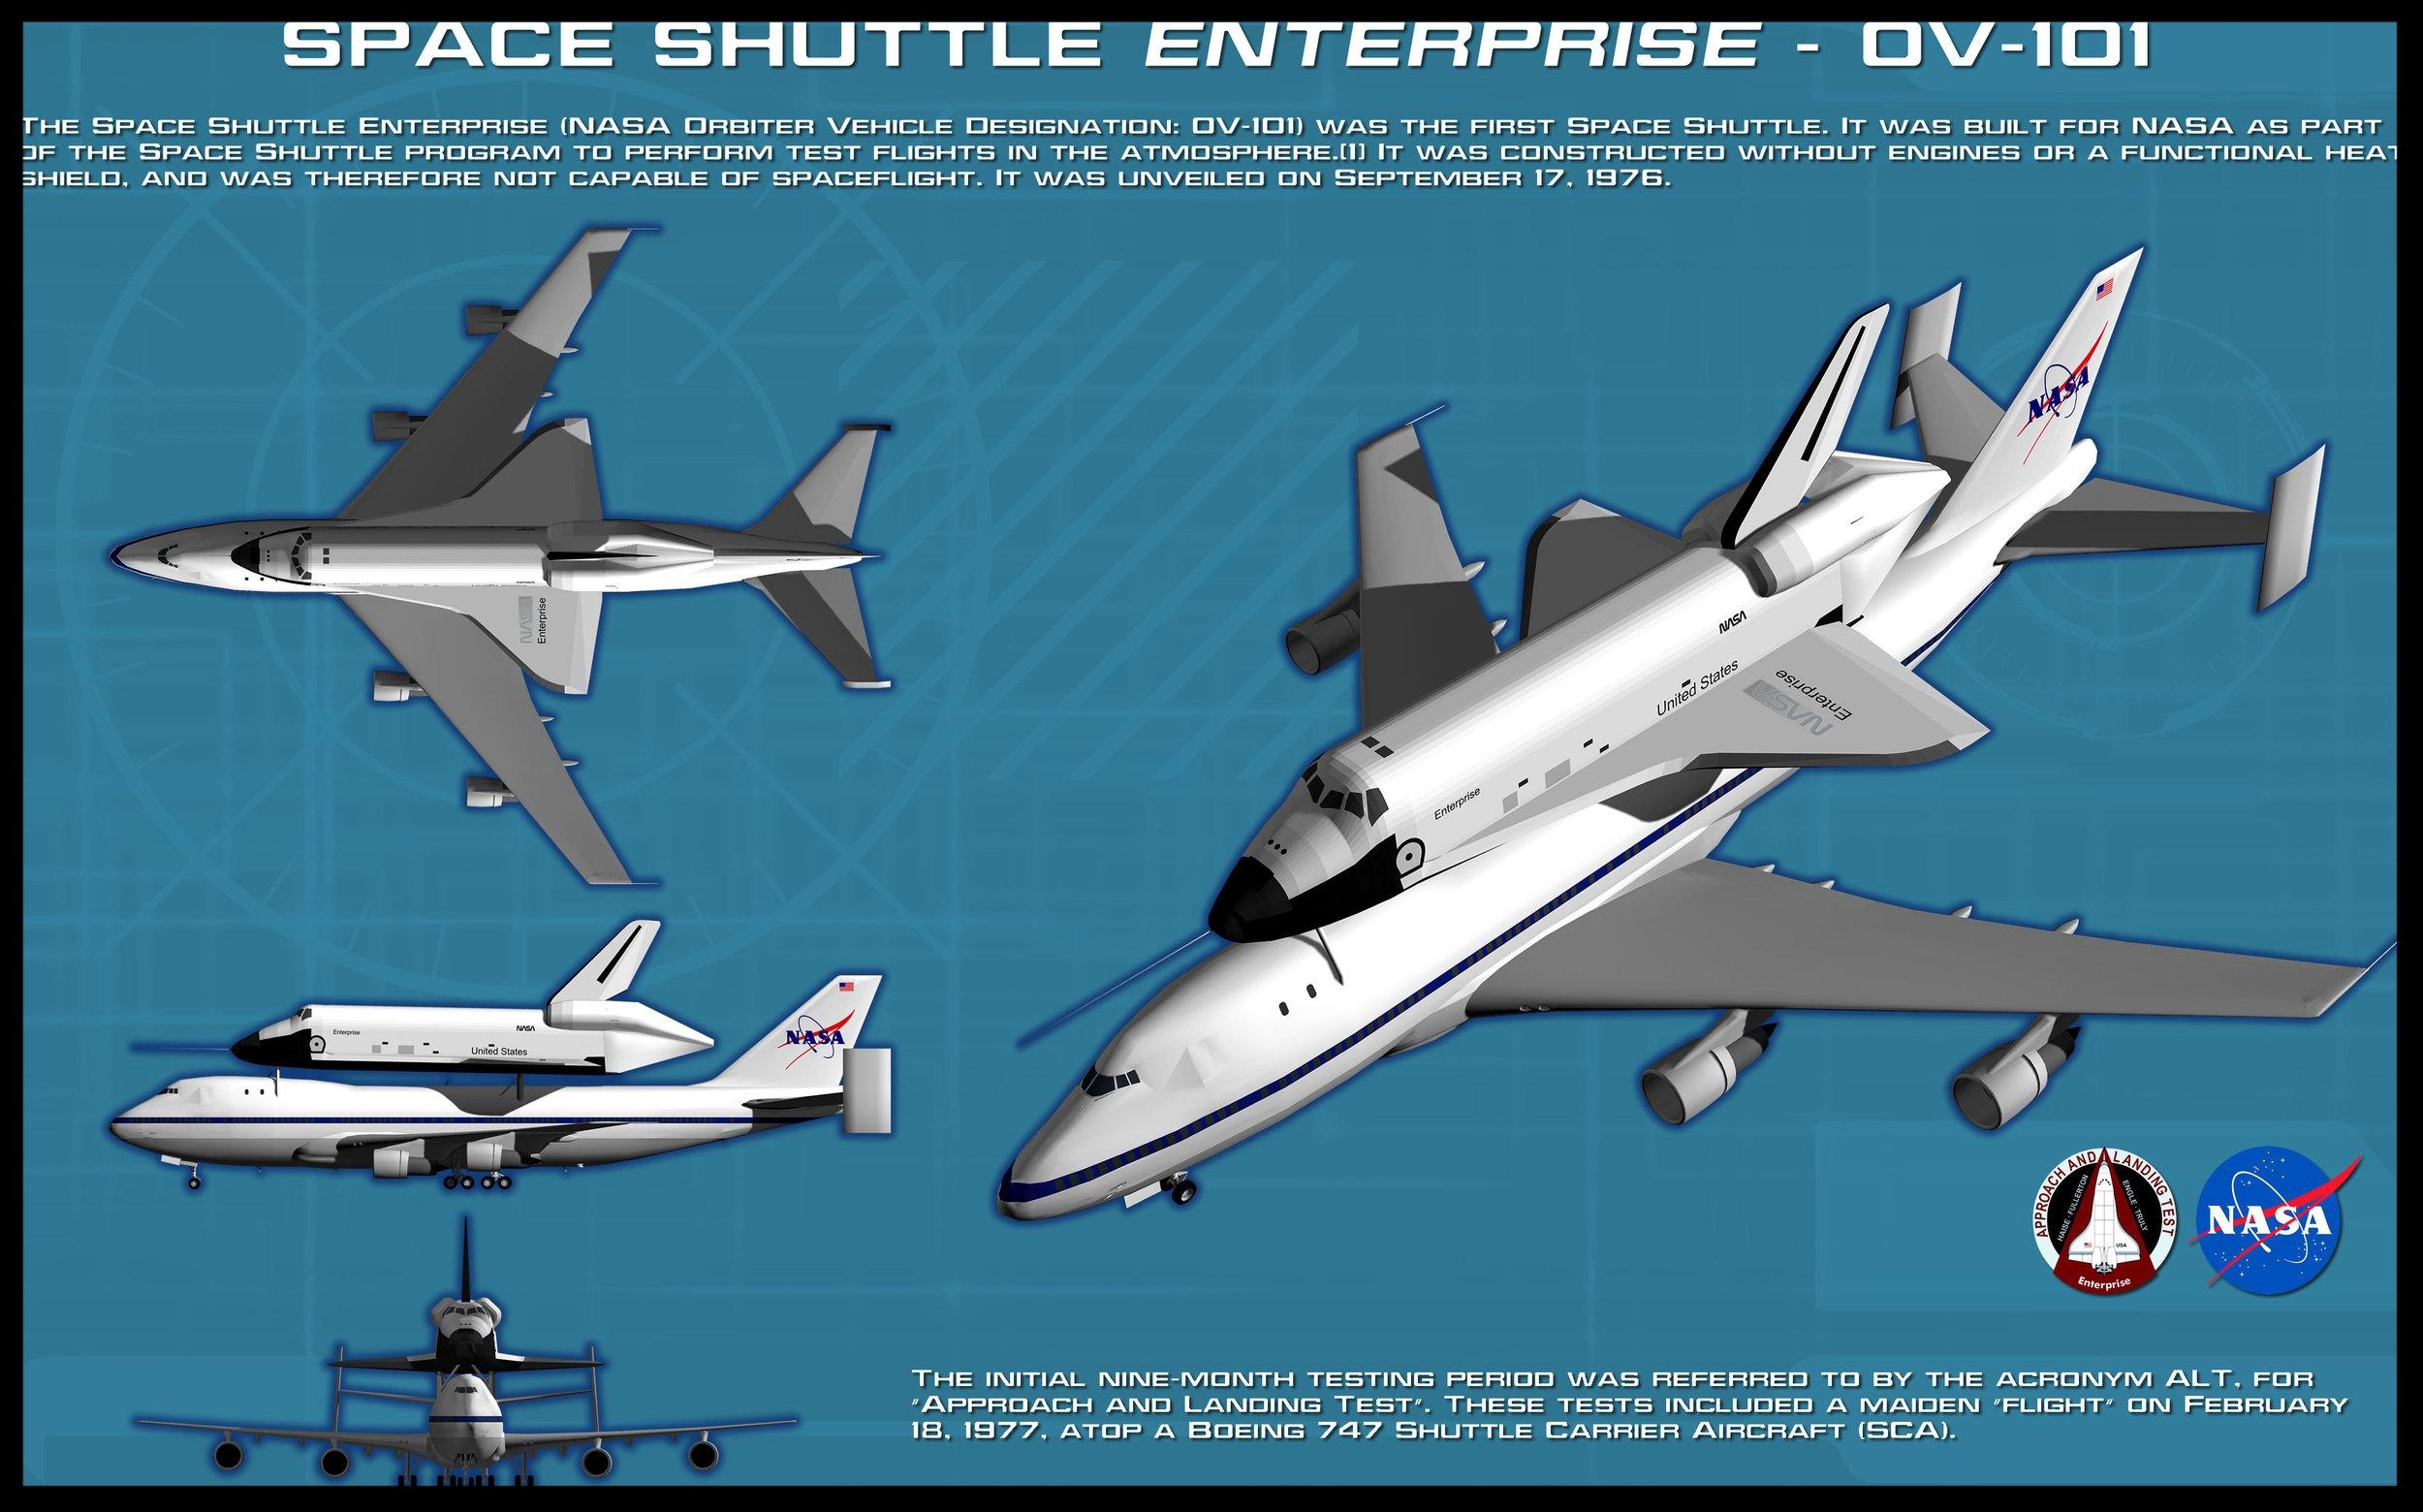 Space Shuttle Enterprise OV-101